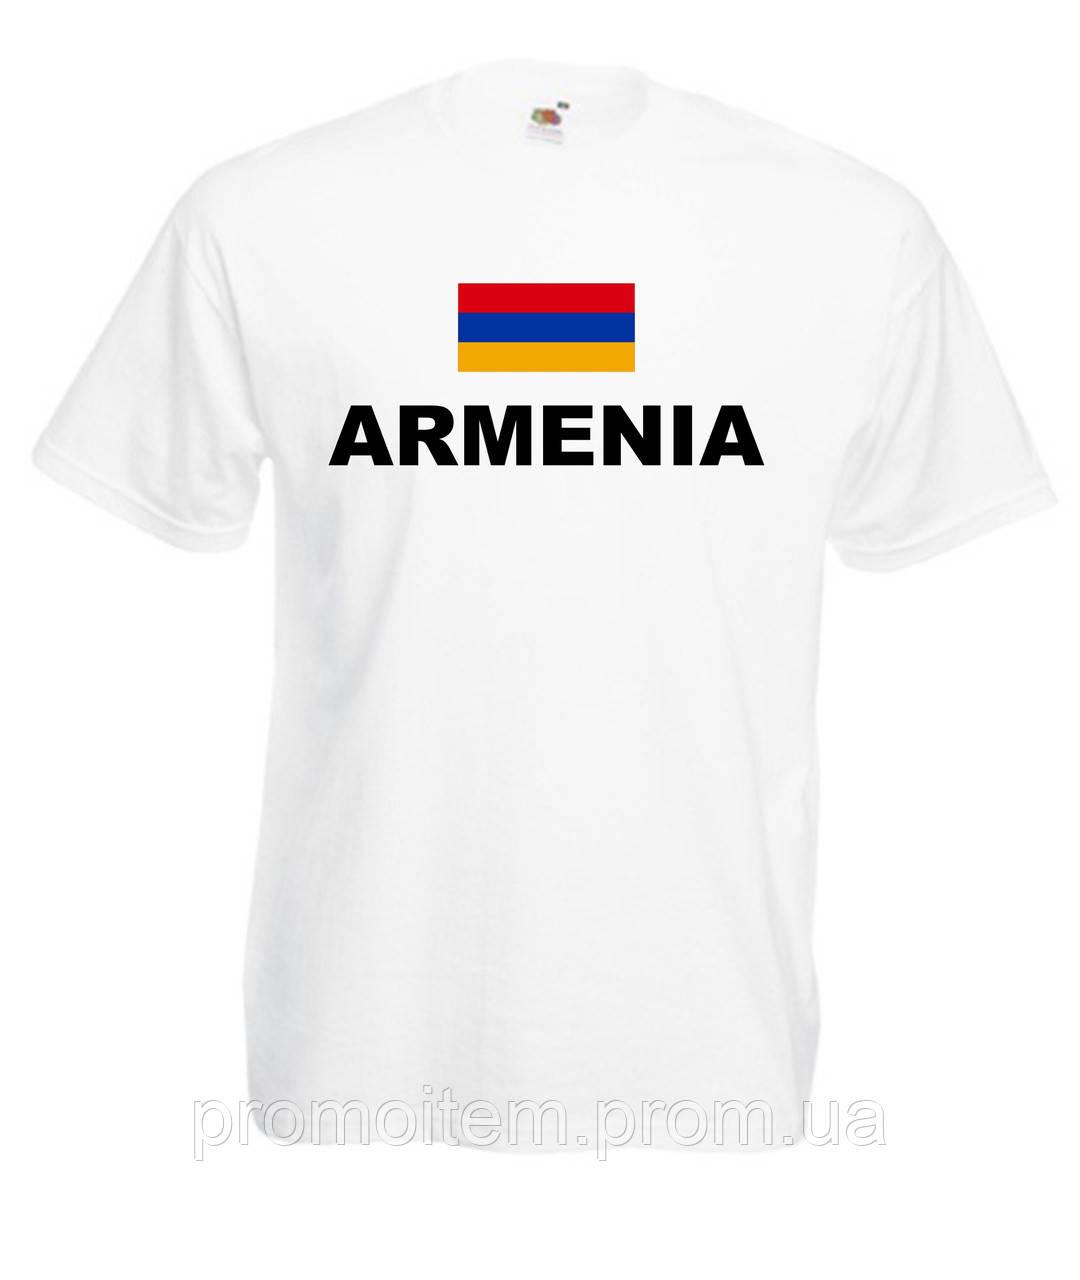 028cc273cf8f Патриотические футболки страны (Армения с флагом)